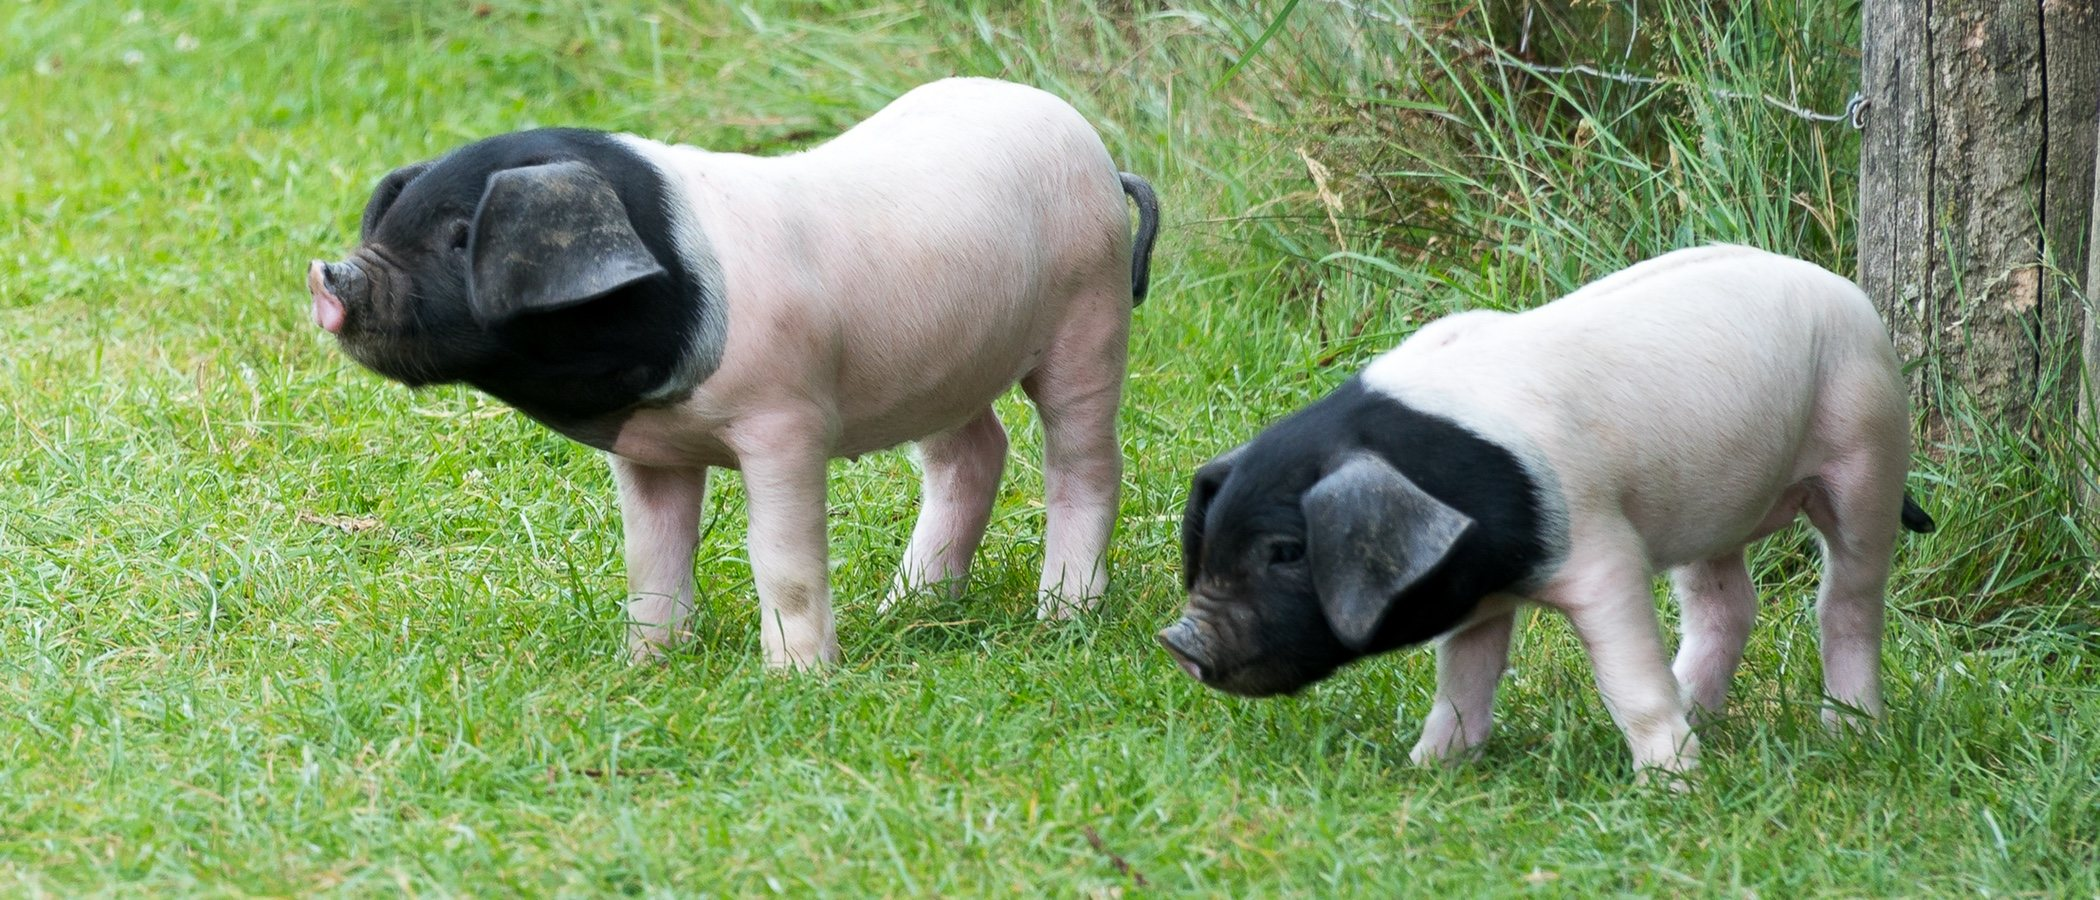 Alimentación del mini pig o cerdo en miniatura